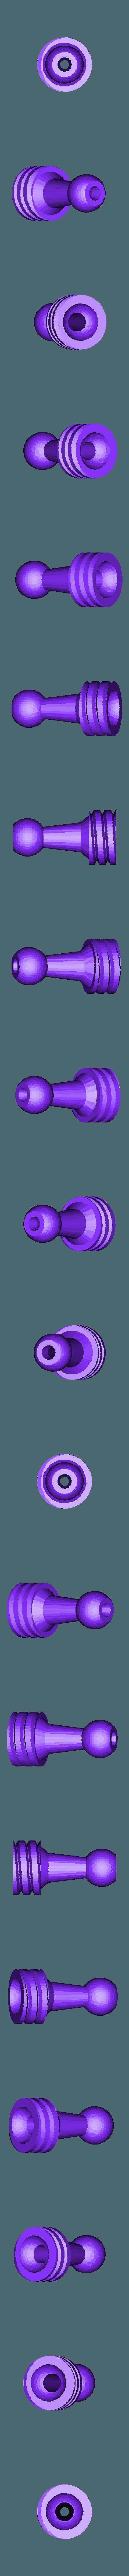 C920_Mount_-_Ball.stl Download free STL file CR10, Ender Logitech c920, c270, c310, c910 20/20 camera mount system • 3D printing object, FedorSosnin